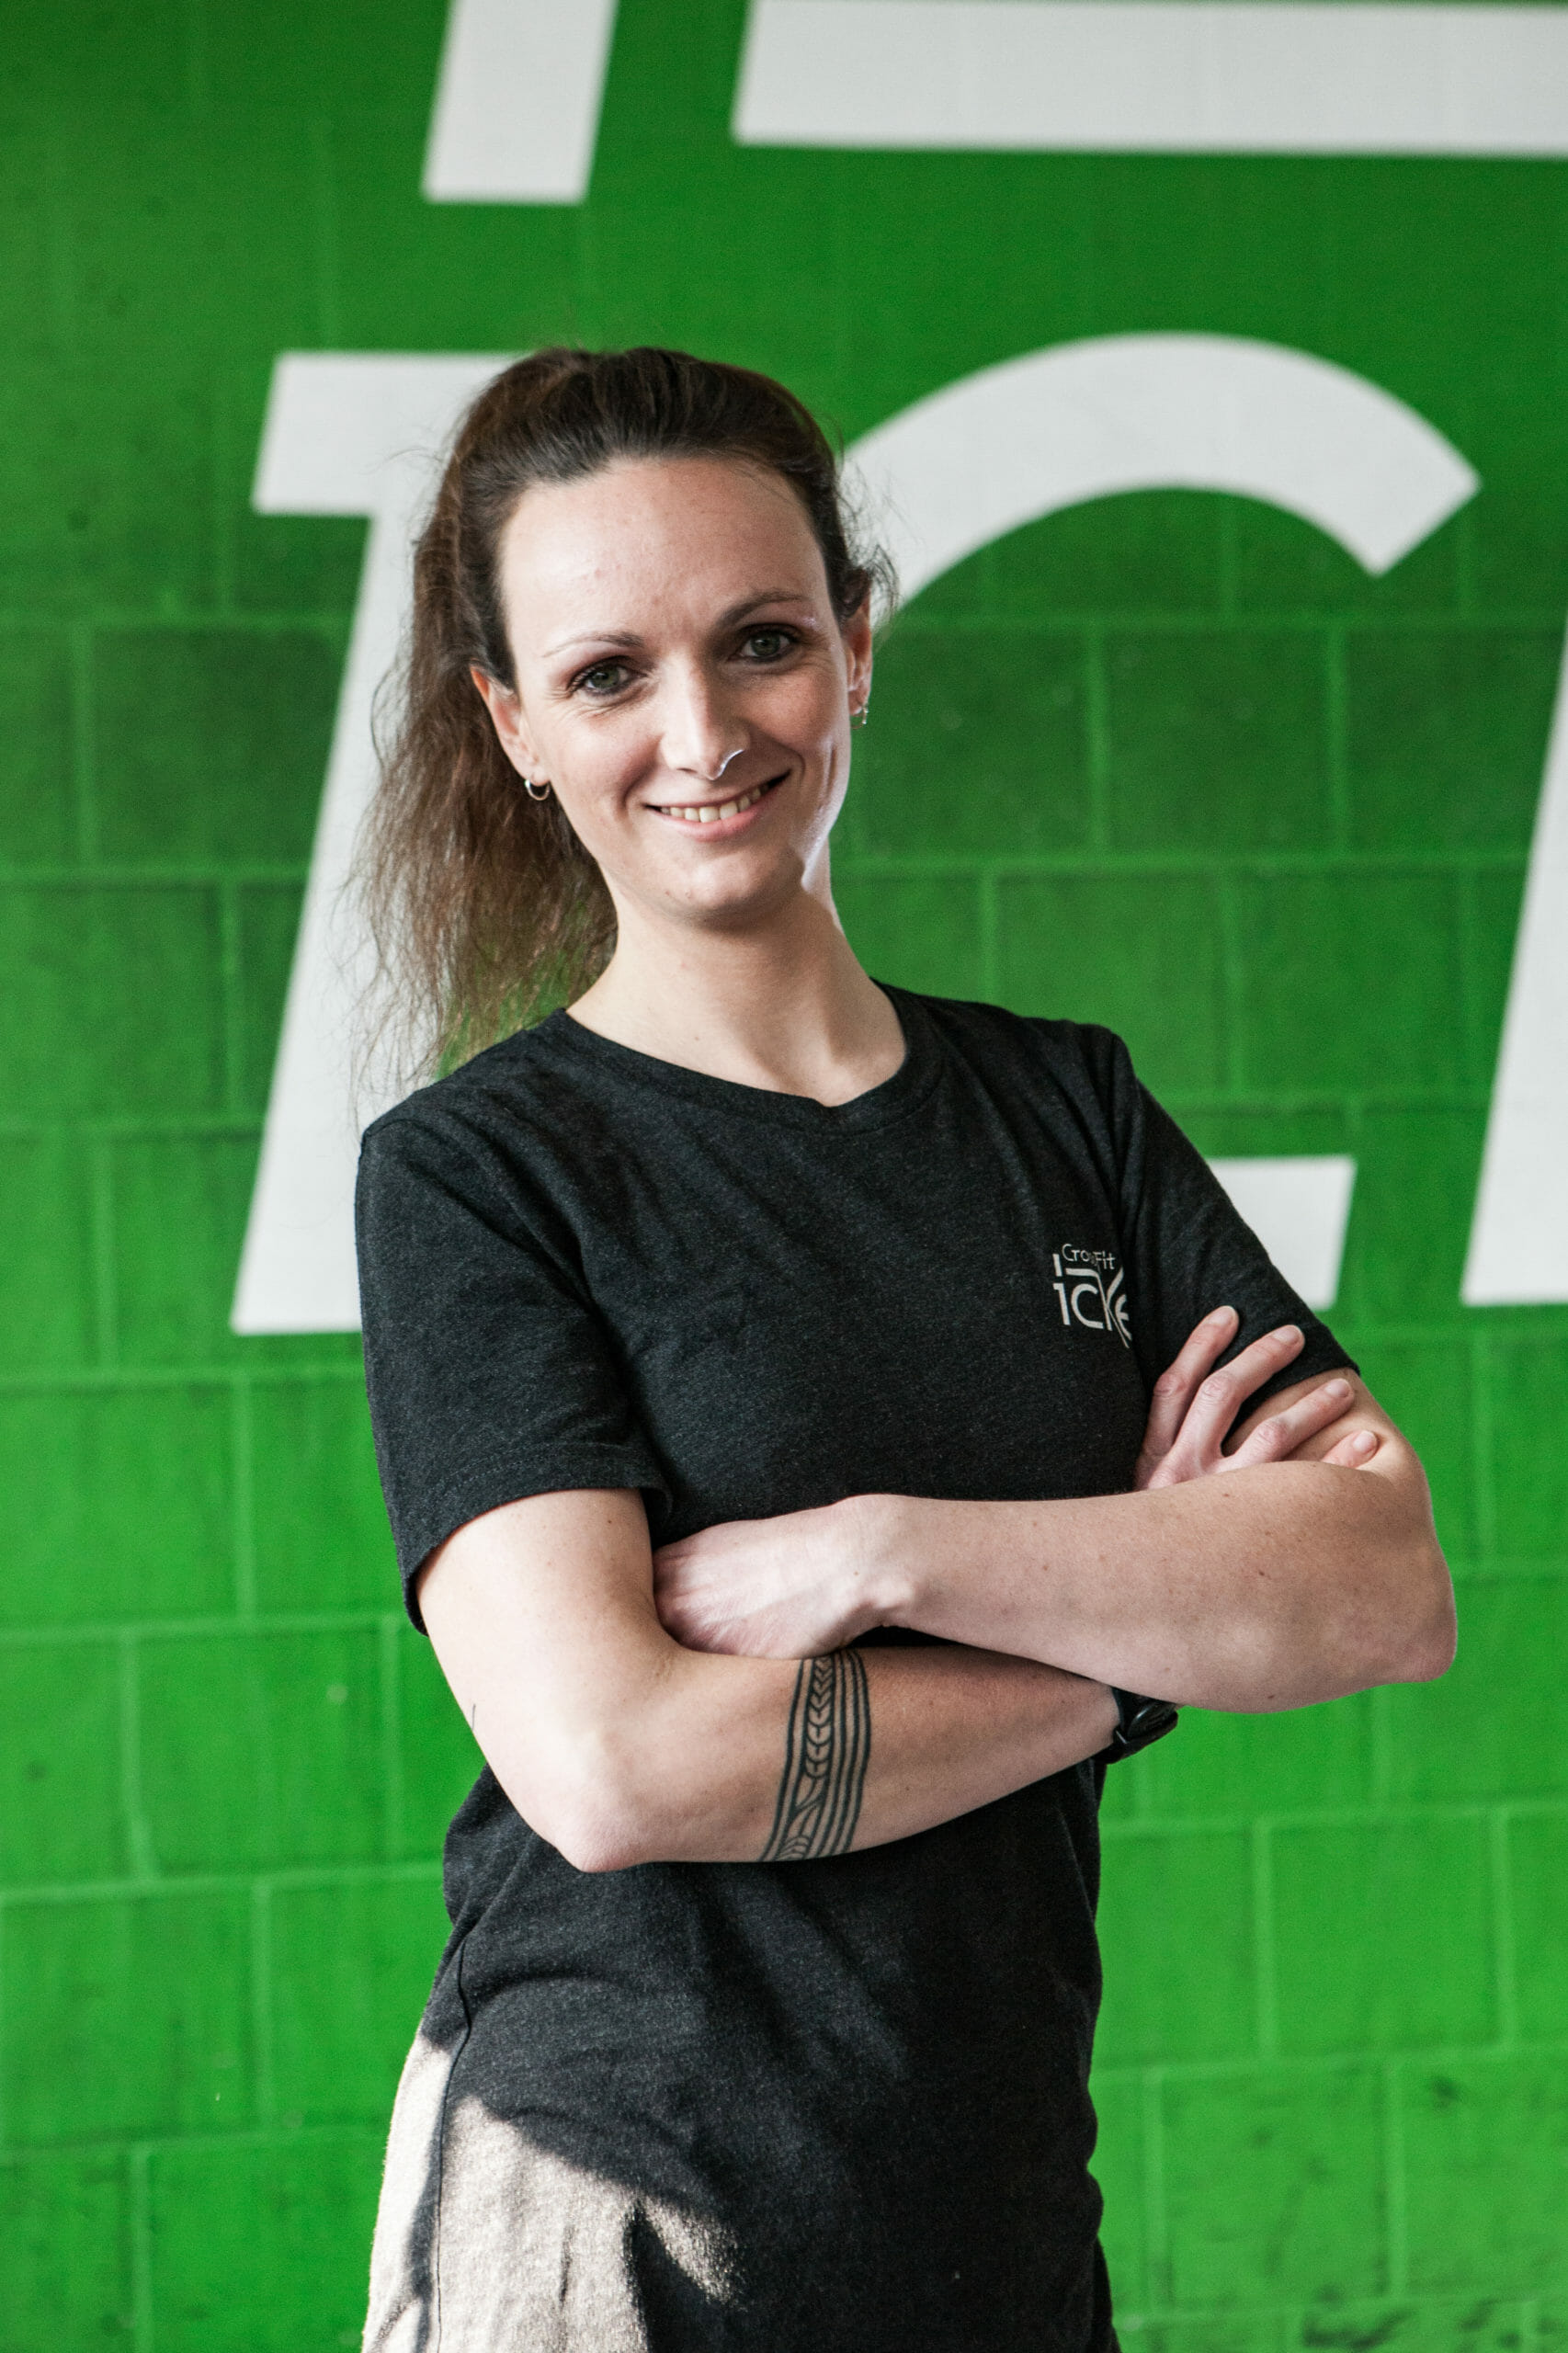 Cosima Degischer - Team Icke Physiotherapie